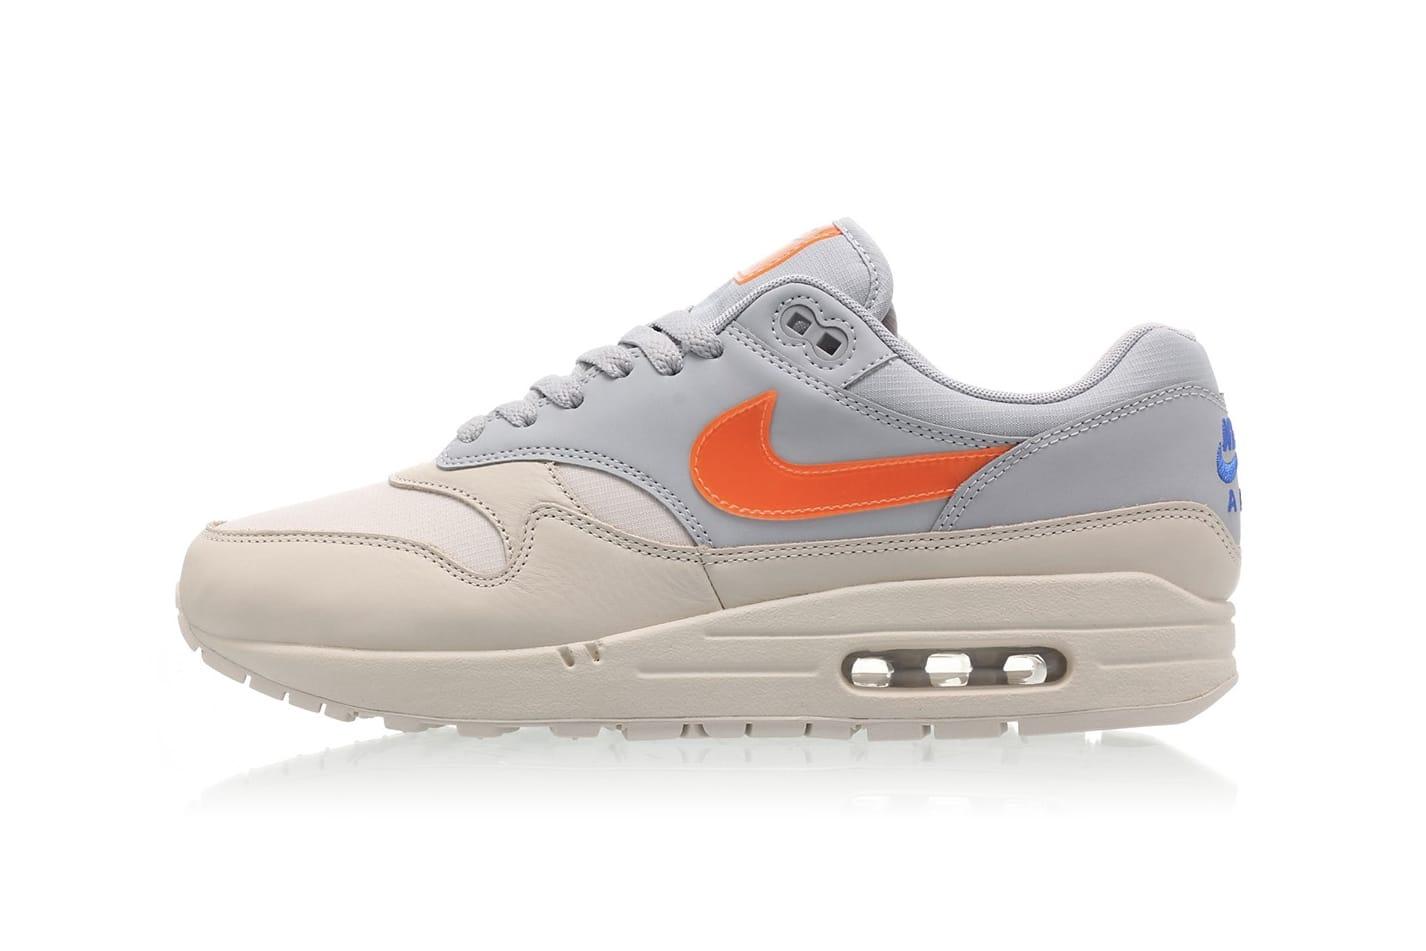 Nike Drops the Air Max 1 With an Orange